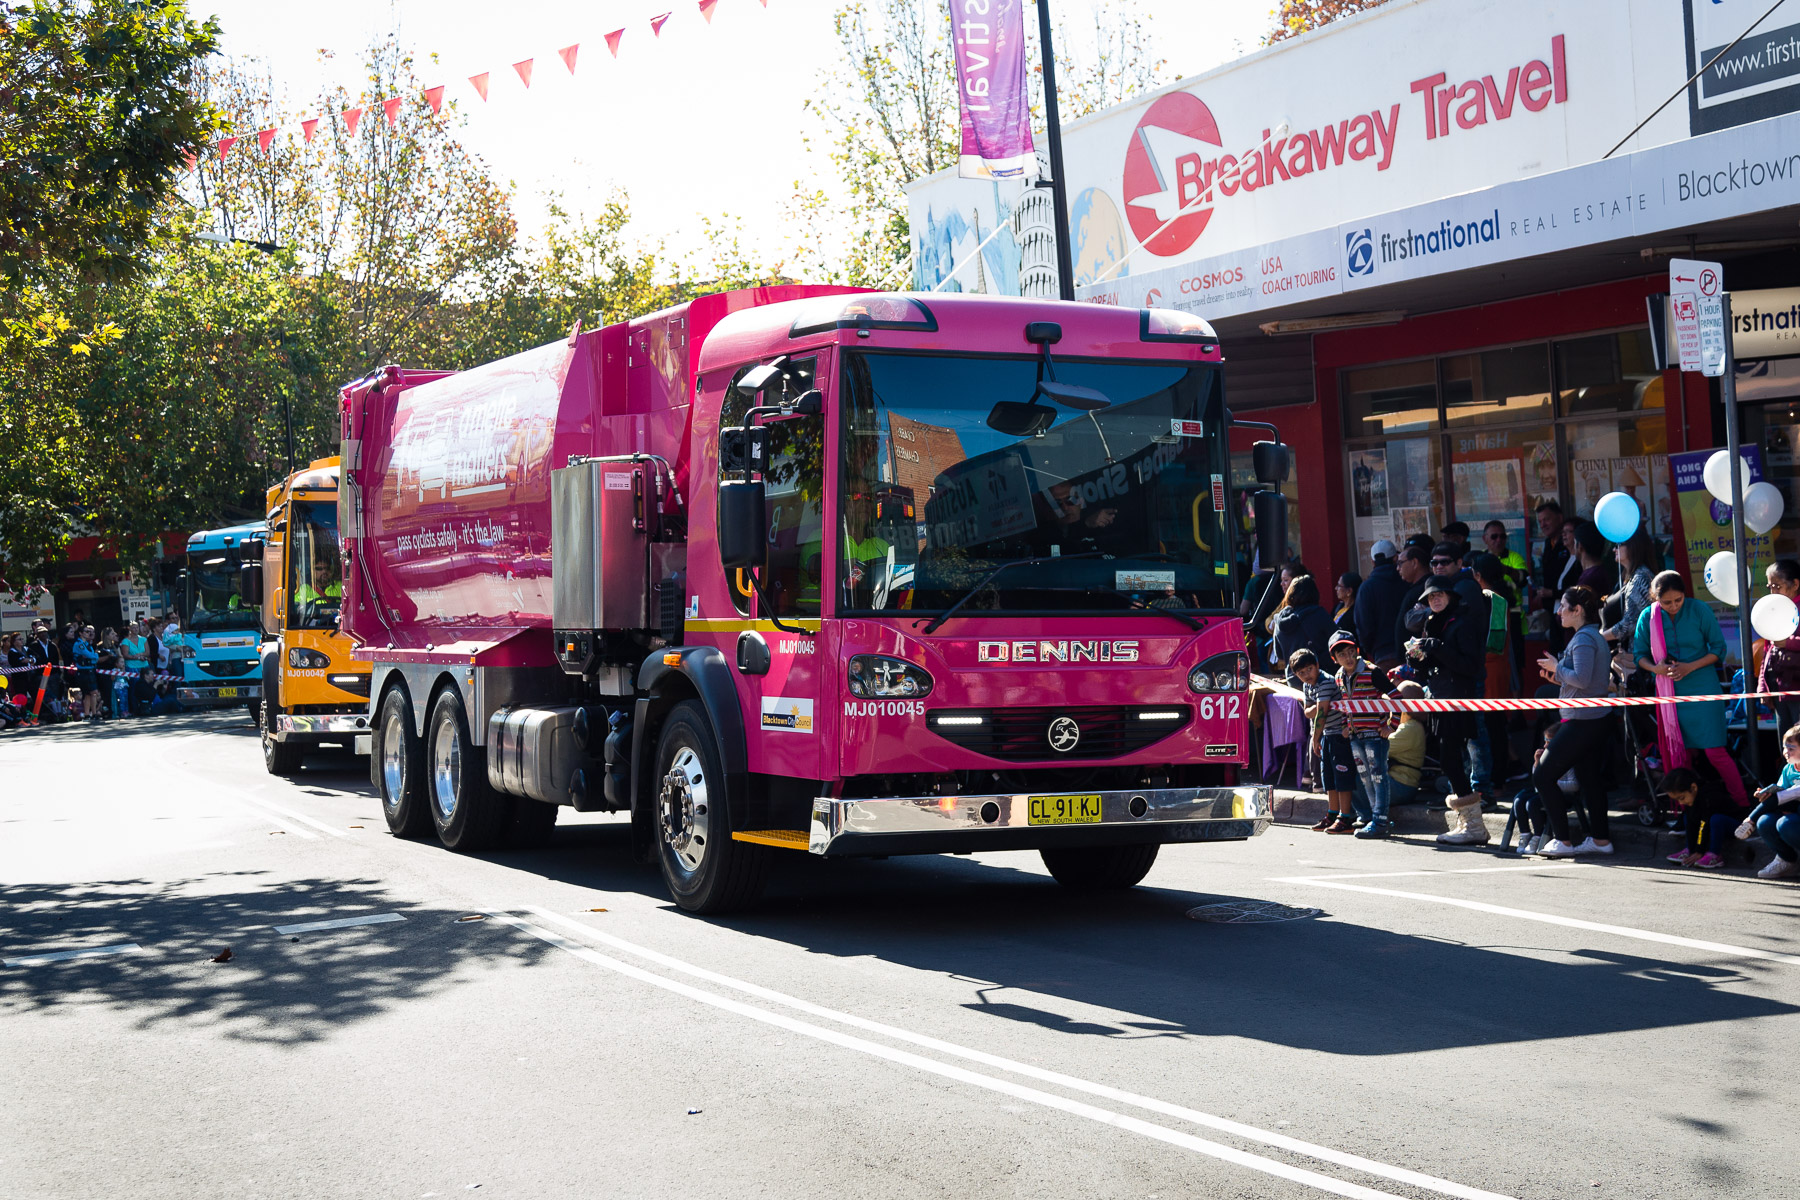 Blacktown City Council parades charity trucks